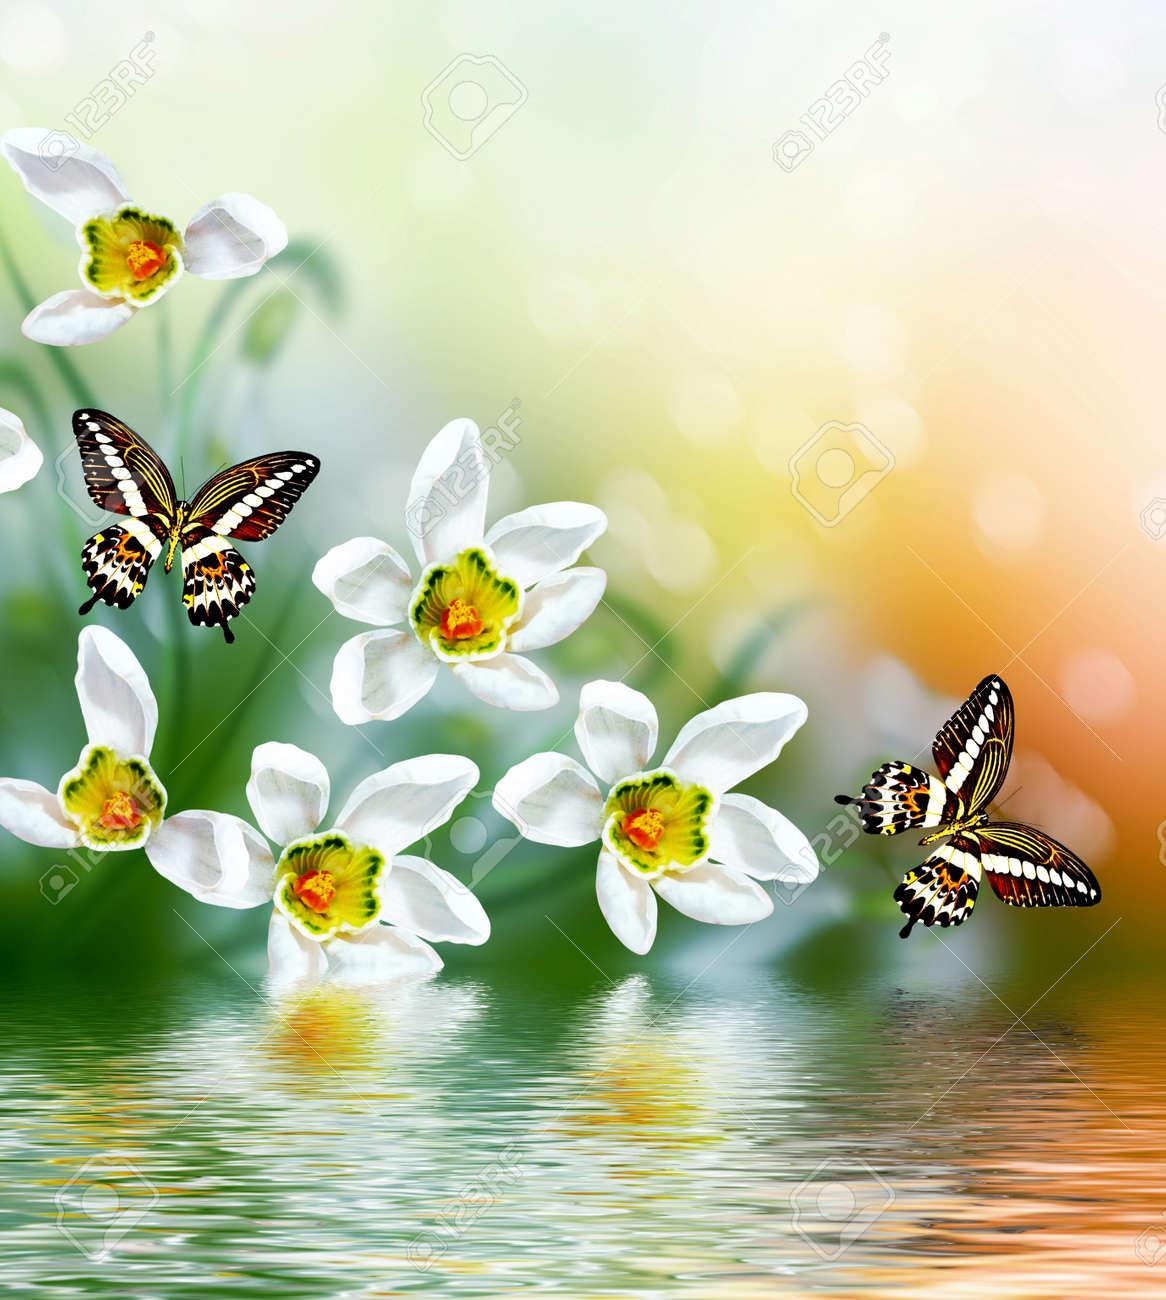 Spring Landscape Flowers Snowdrops Delicate Spring Flower Stock